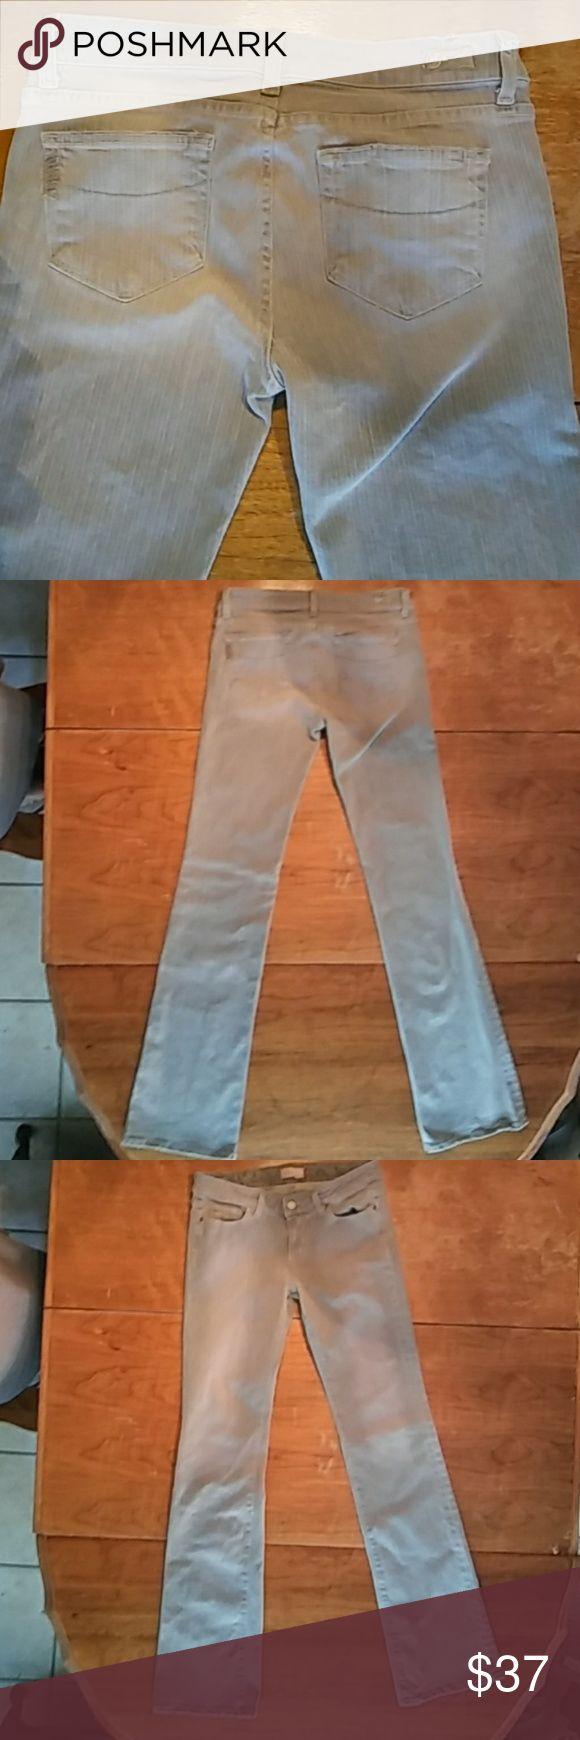 Selling this Paige Premium denim grey jeans on Poshmark! My username is: brandwynne. #shopmycloset #poshmark #fashion #shopping #style #forsale #Paige Jeans #Denim